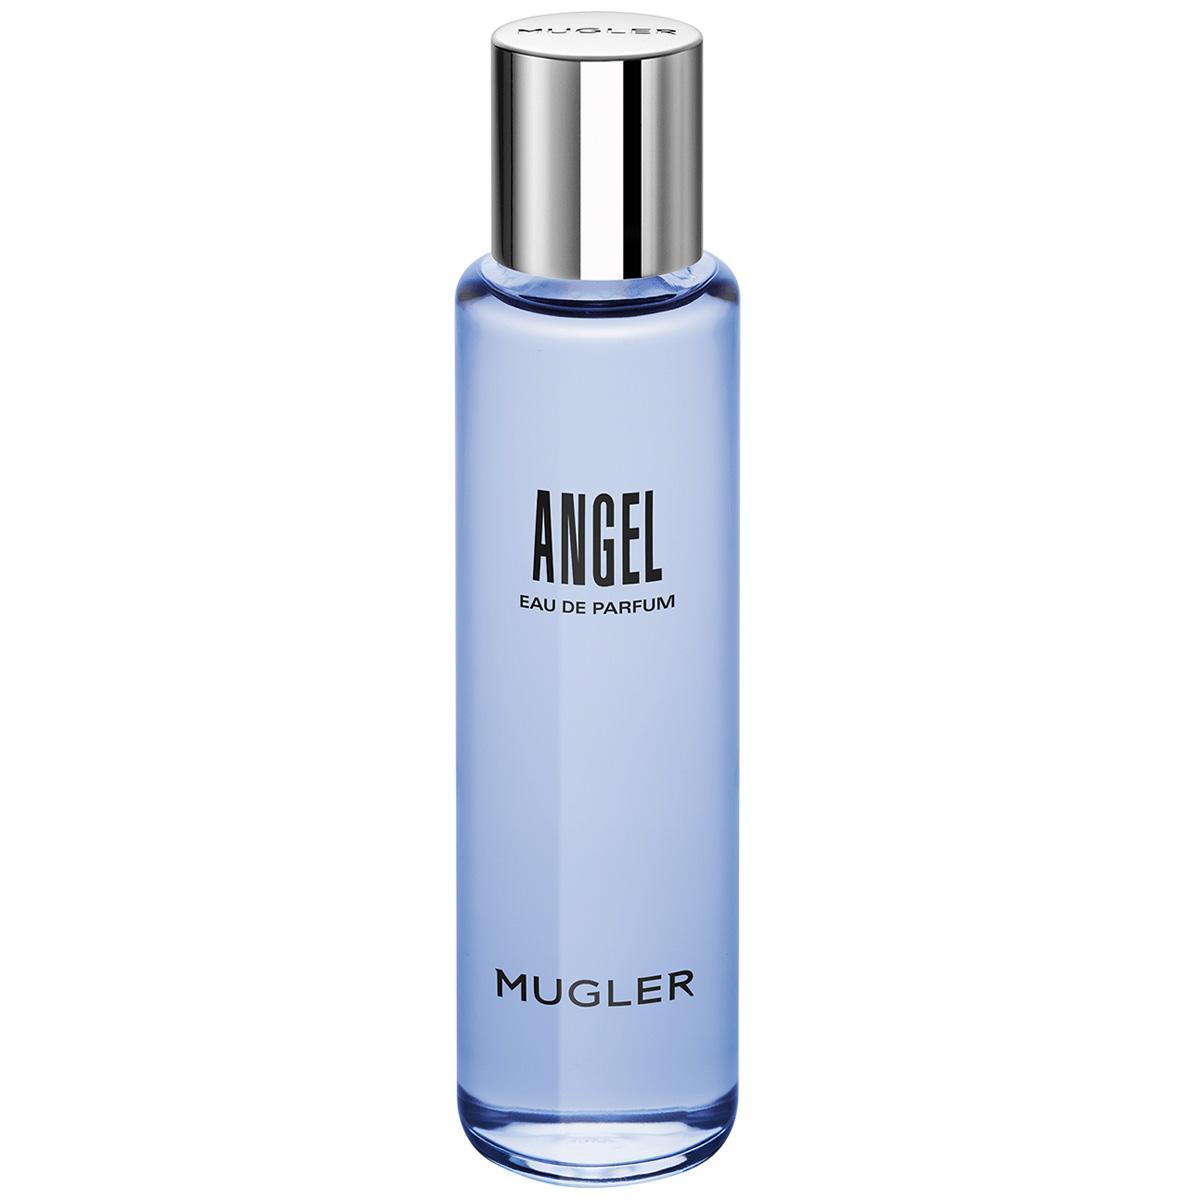 Angel Eau de Parfum Flacon Source - MUGLER